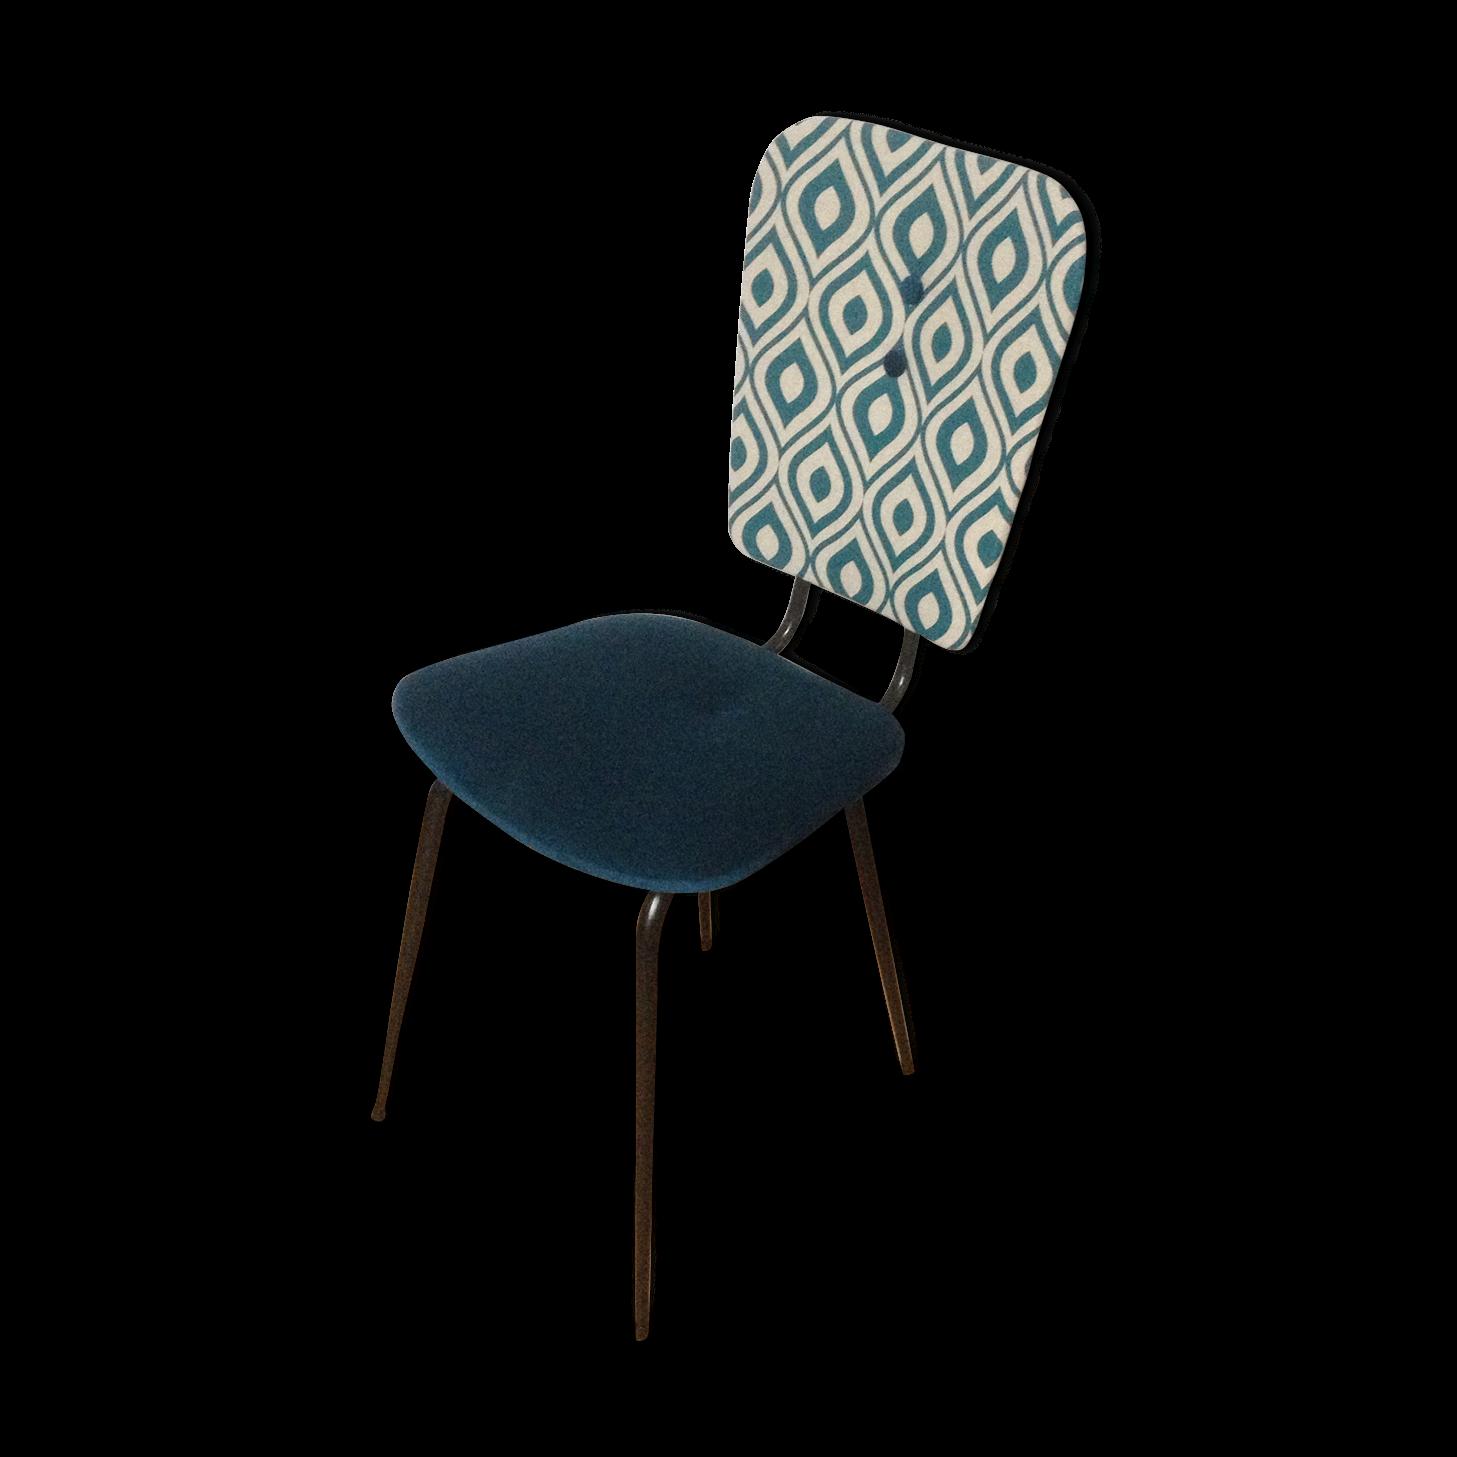 chaise bleu canard blue duck suzie chair u brushed steel. Black Bedroom Furniture Sets. Home Design Ideas